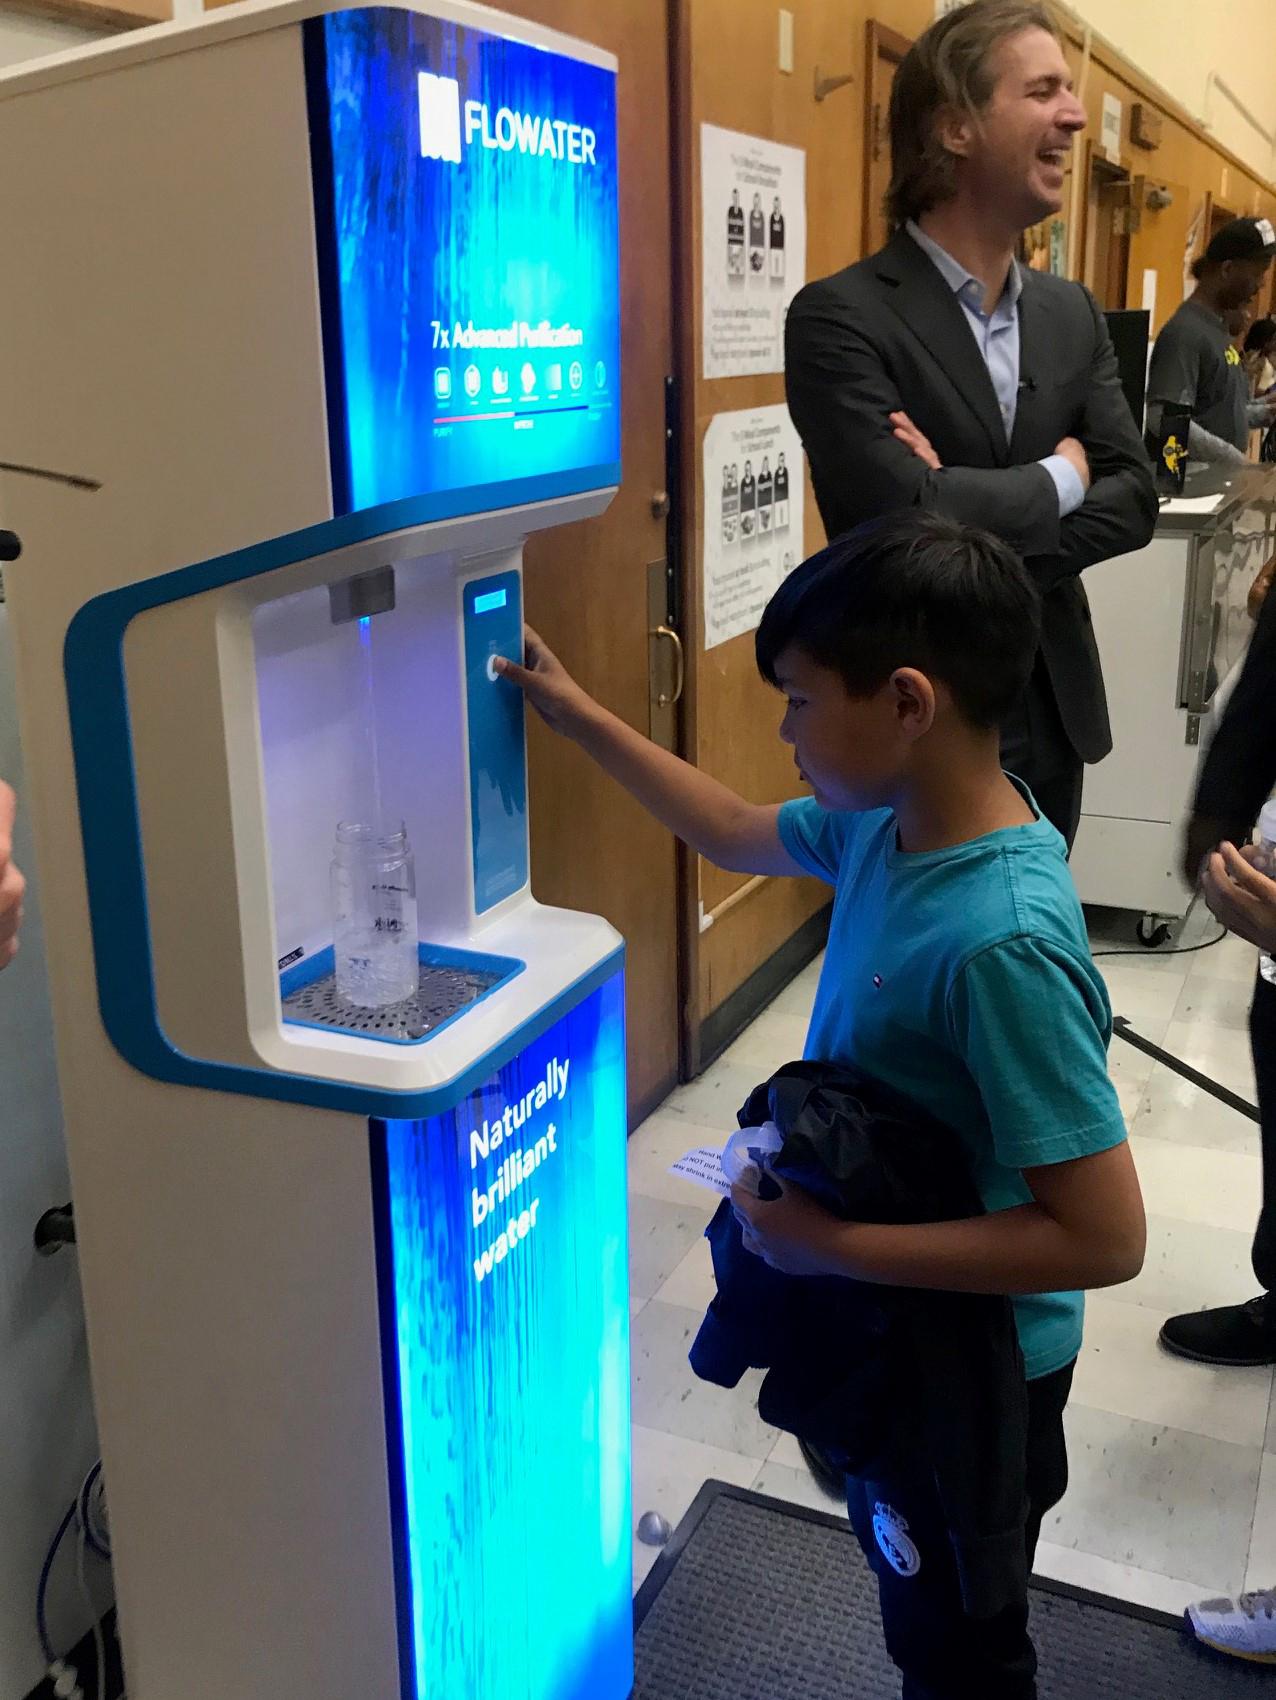 Oakland Schools Deploy New-Tech FloWater Refill Stations